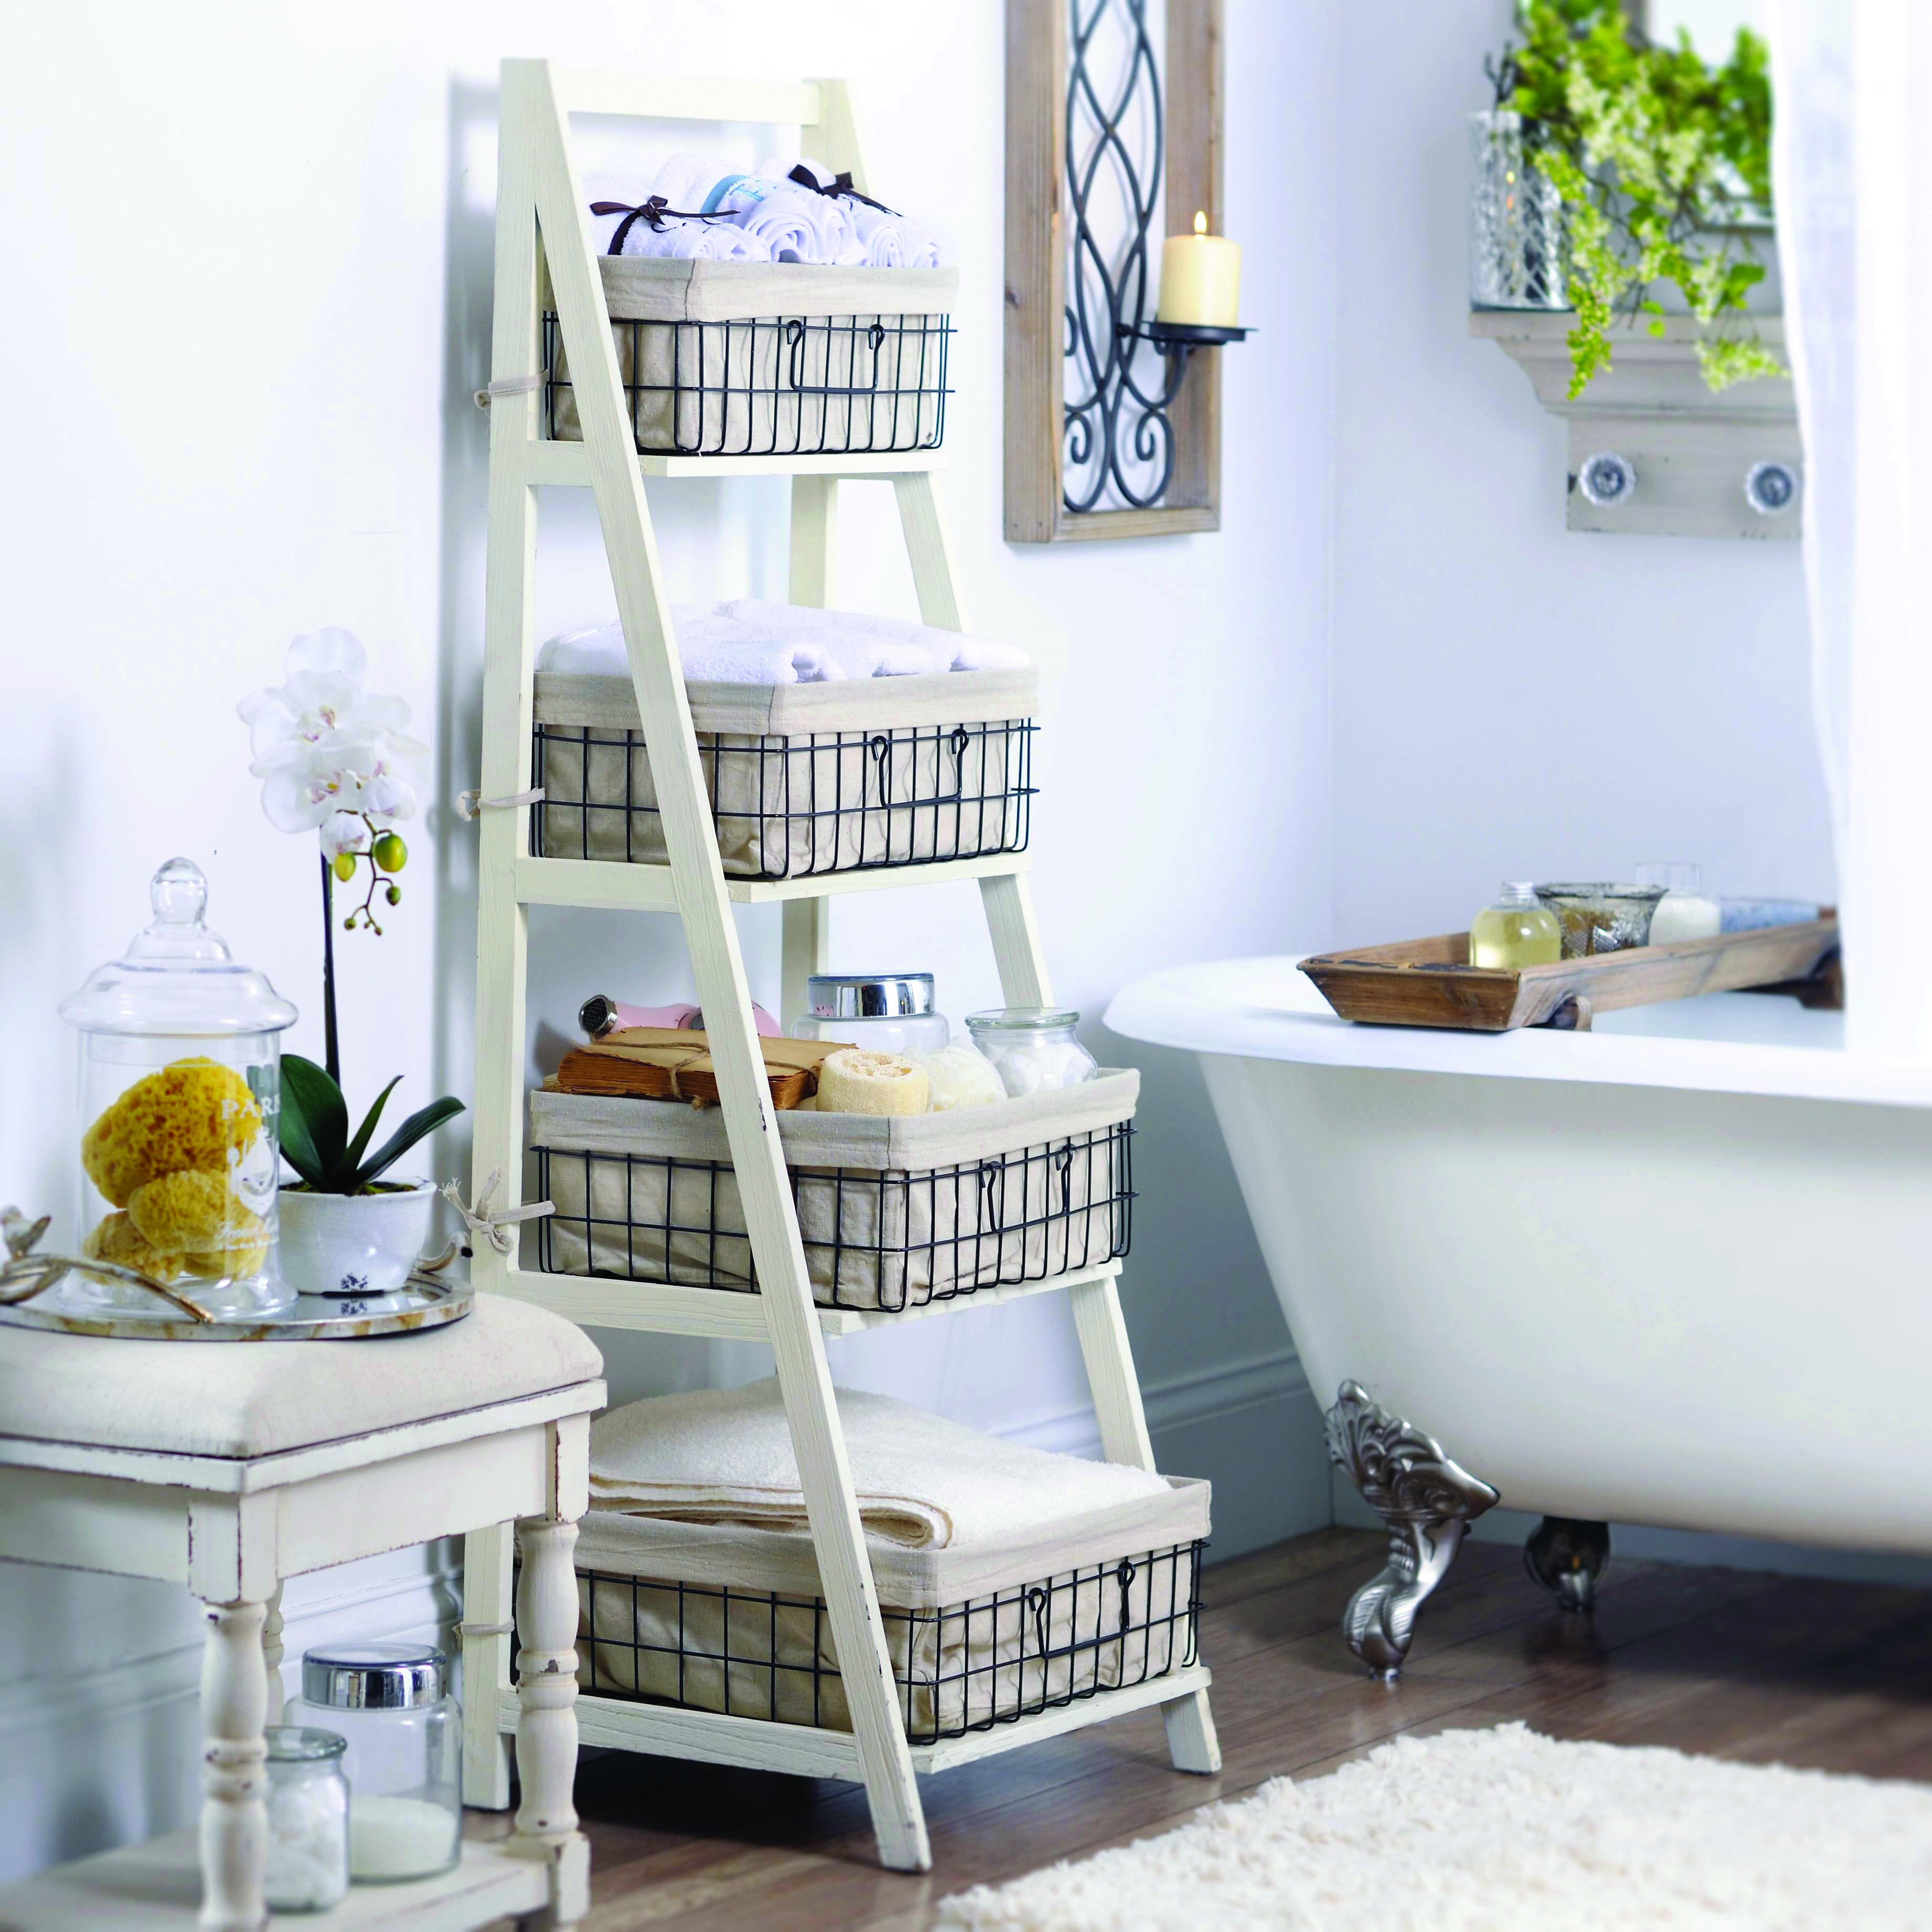 Unique Ladder Shelf Espresso For Your Cozy Home Wooden Ladder Shelf Shelves Ladder Shelf Decor